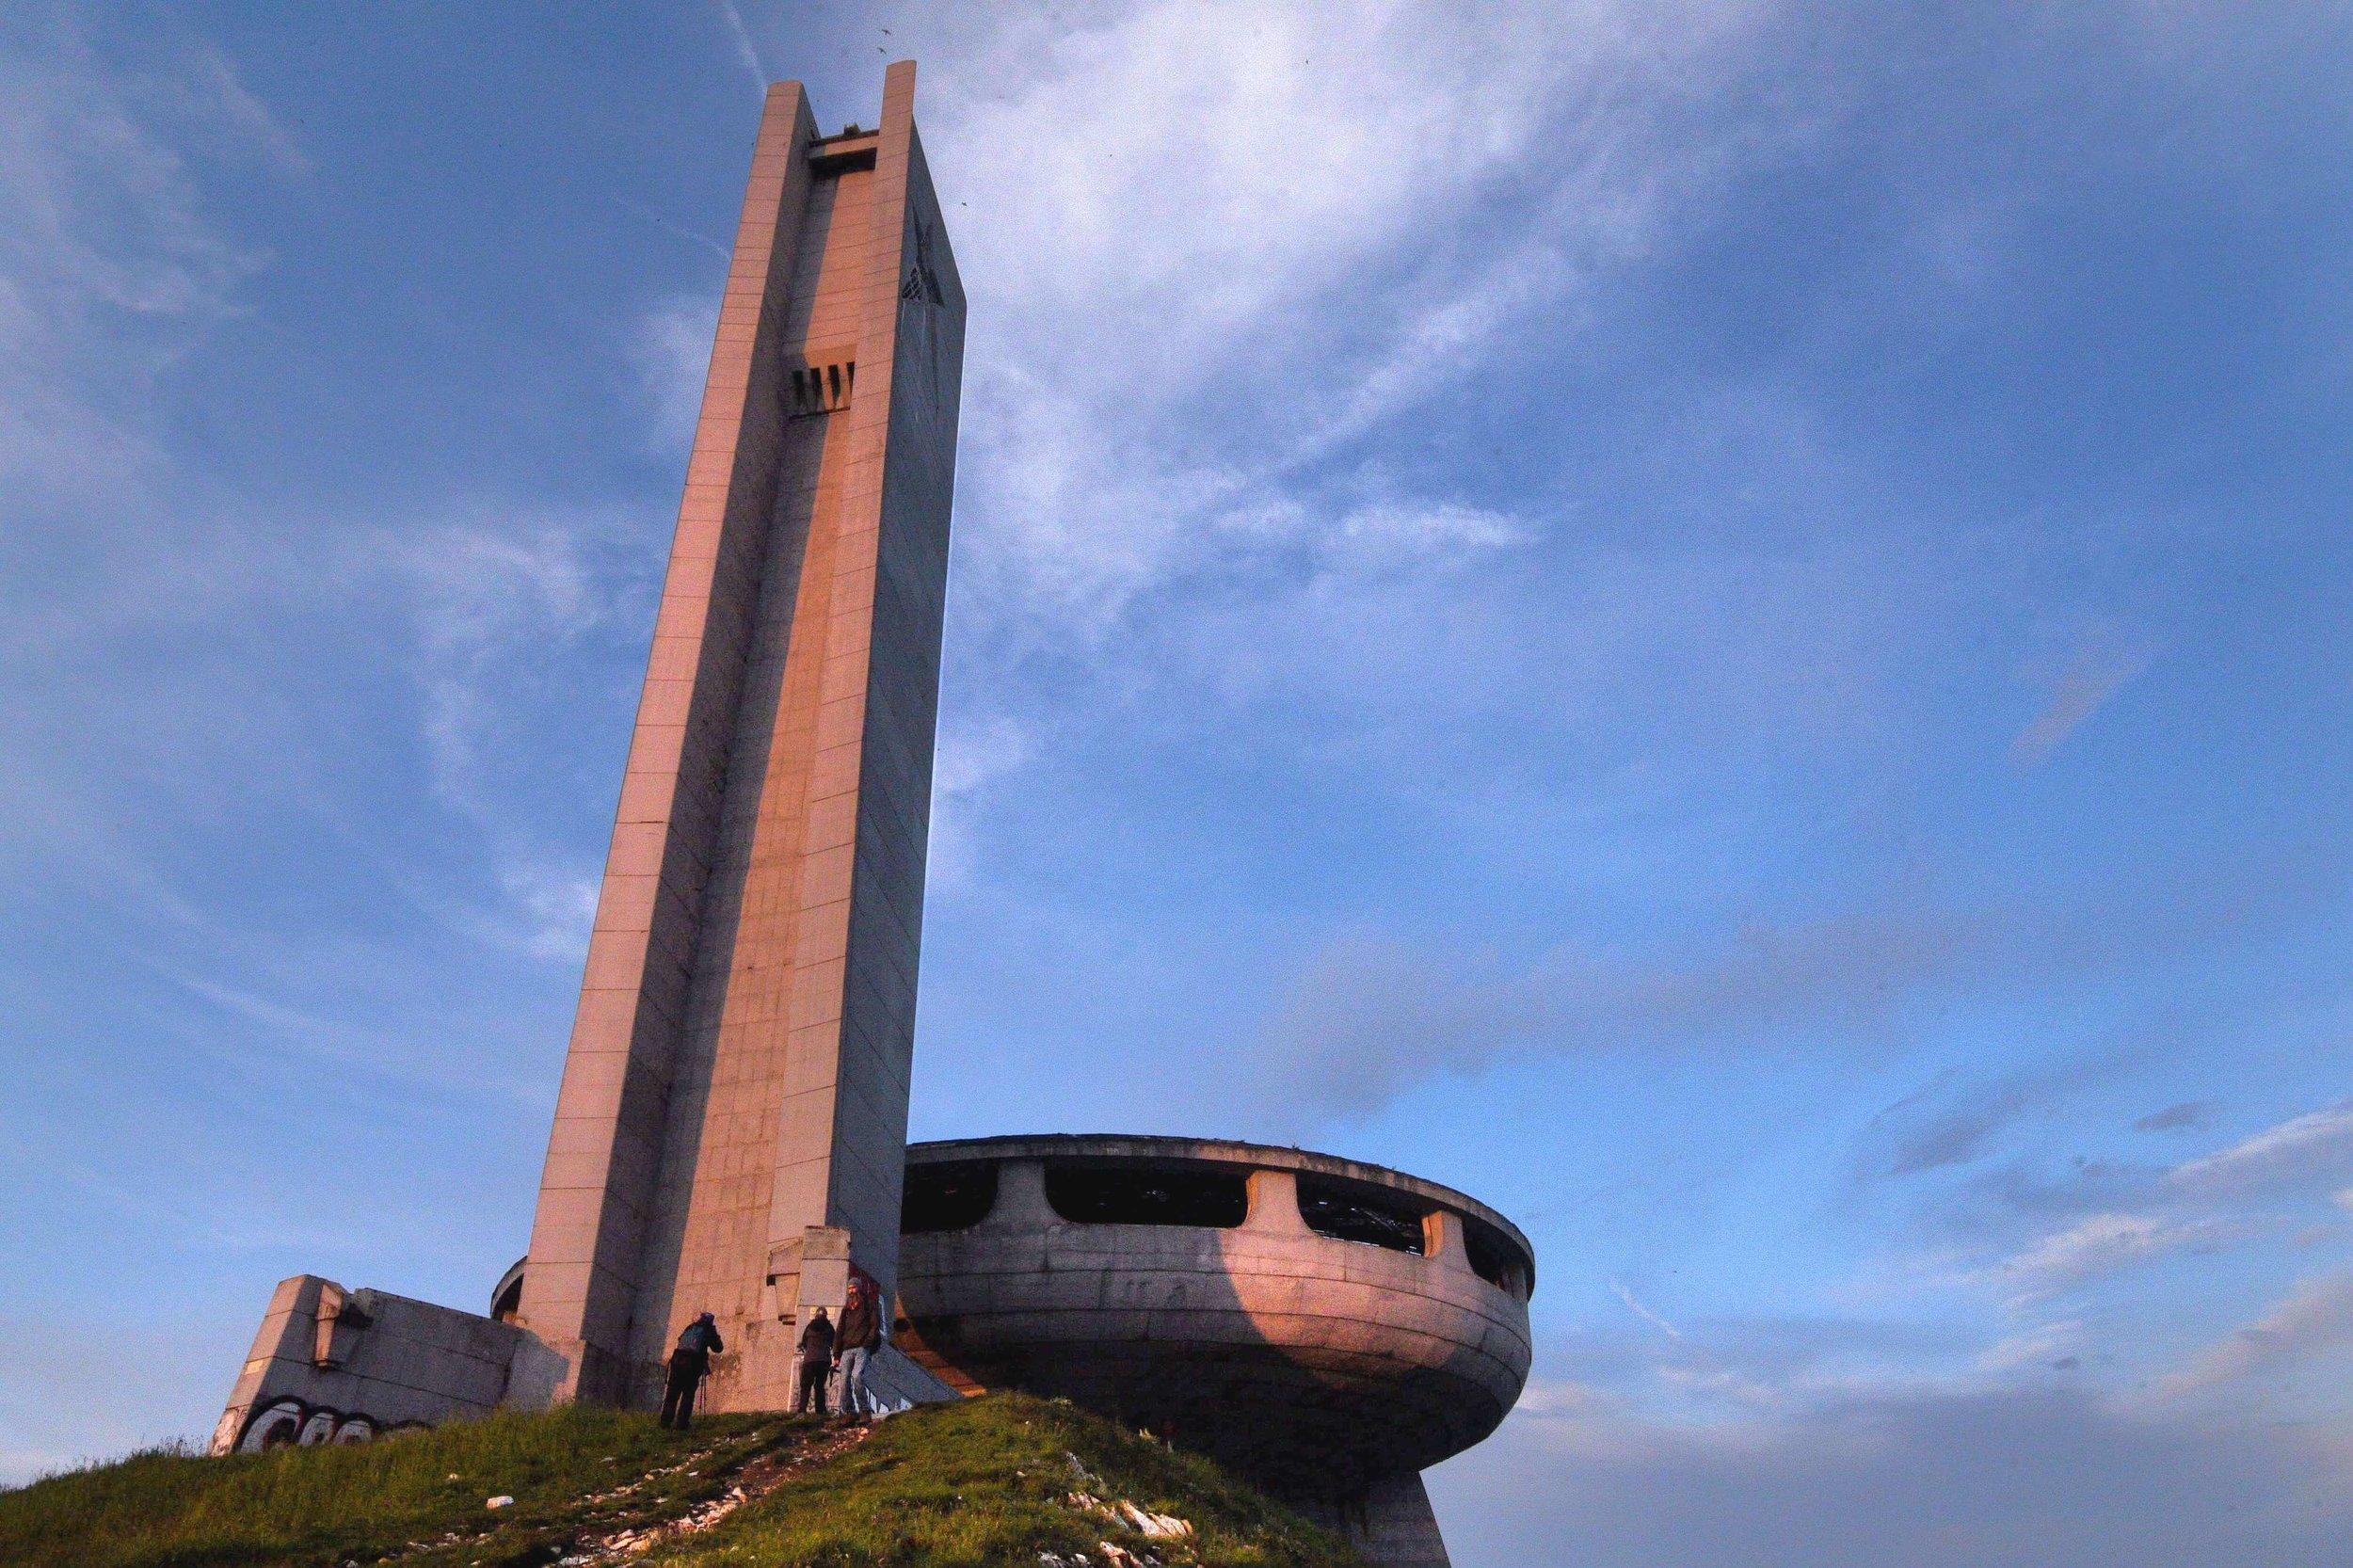 buzludzha-ufo-goldenhour-communist-monument-buzludzha-bulgaria-phototours-phil-2017 (1).jpg